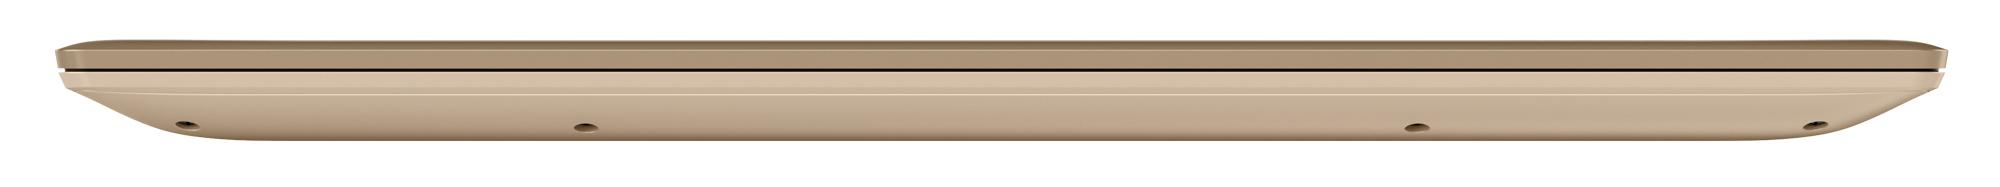 Фото  Ультрабук Lenovo ideapad 320S Golden (81AK00EURA)